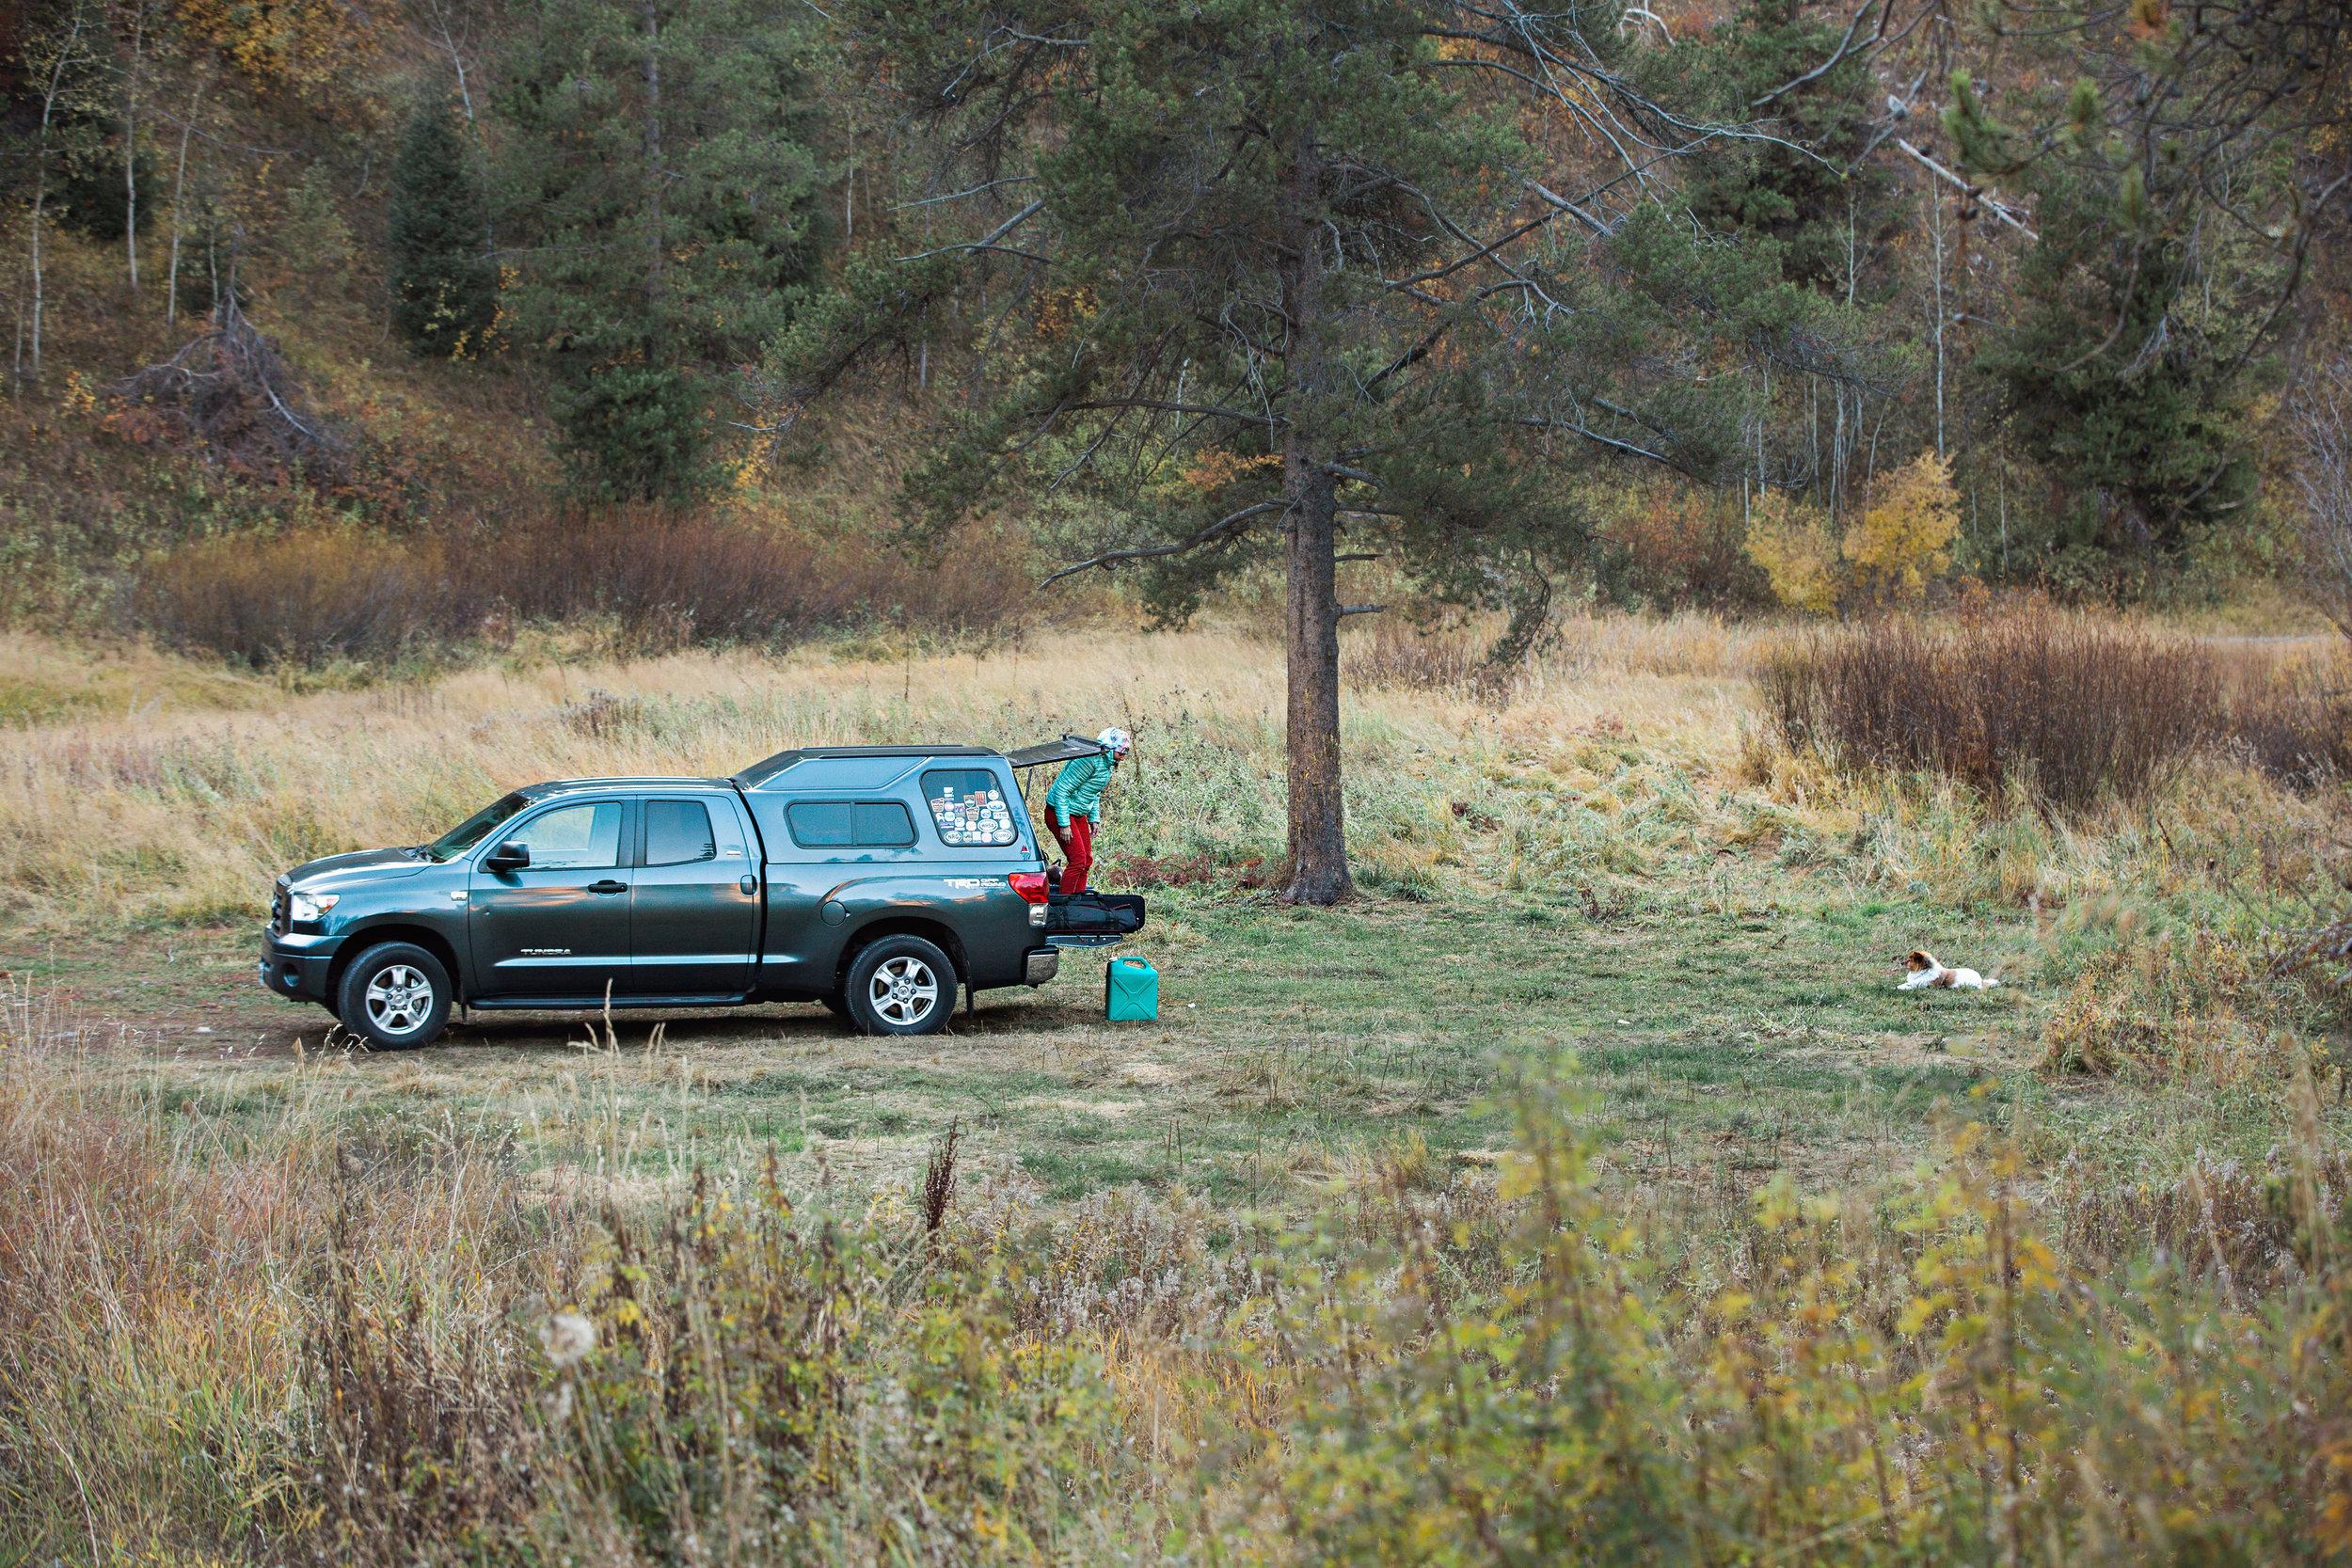 Cindy_Giovagnoli_Idaho_Wyoming_Grand_Teton_National_Park_autumn_aspens_camping_mountains-024.jpg